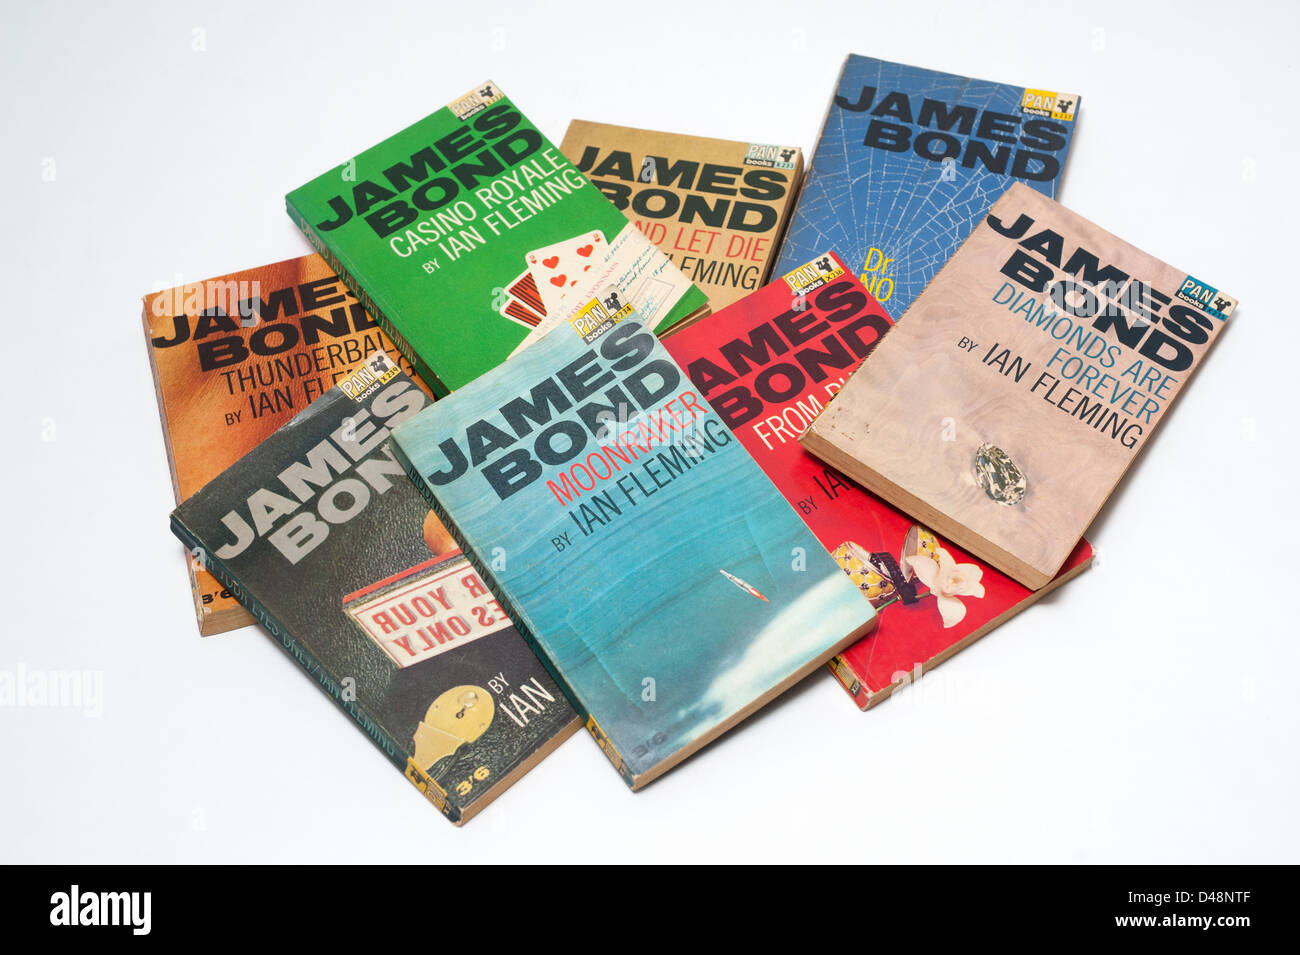 James Bond books written by Ian Fleming - Stock Image